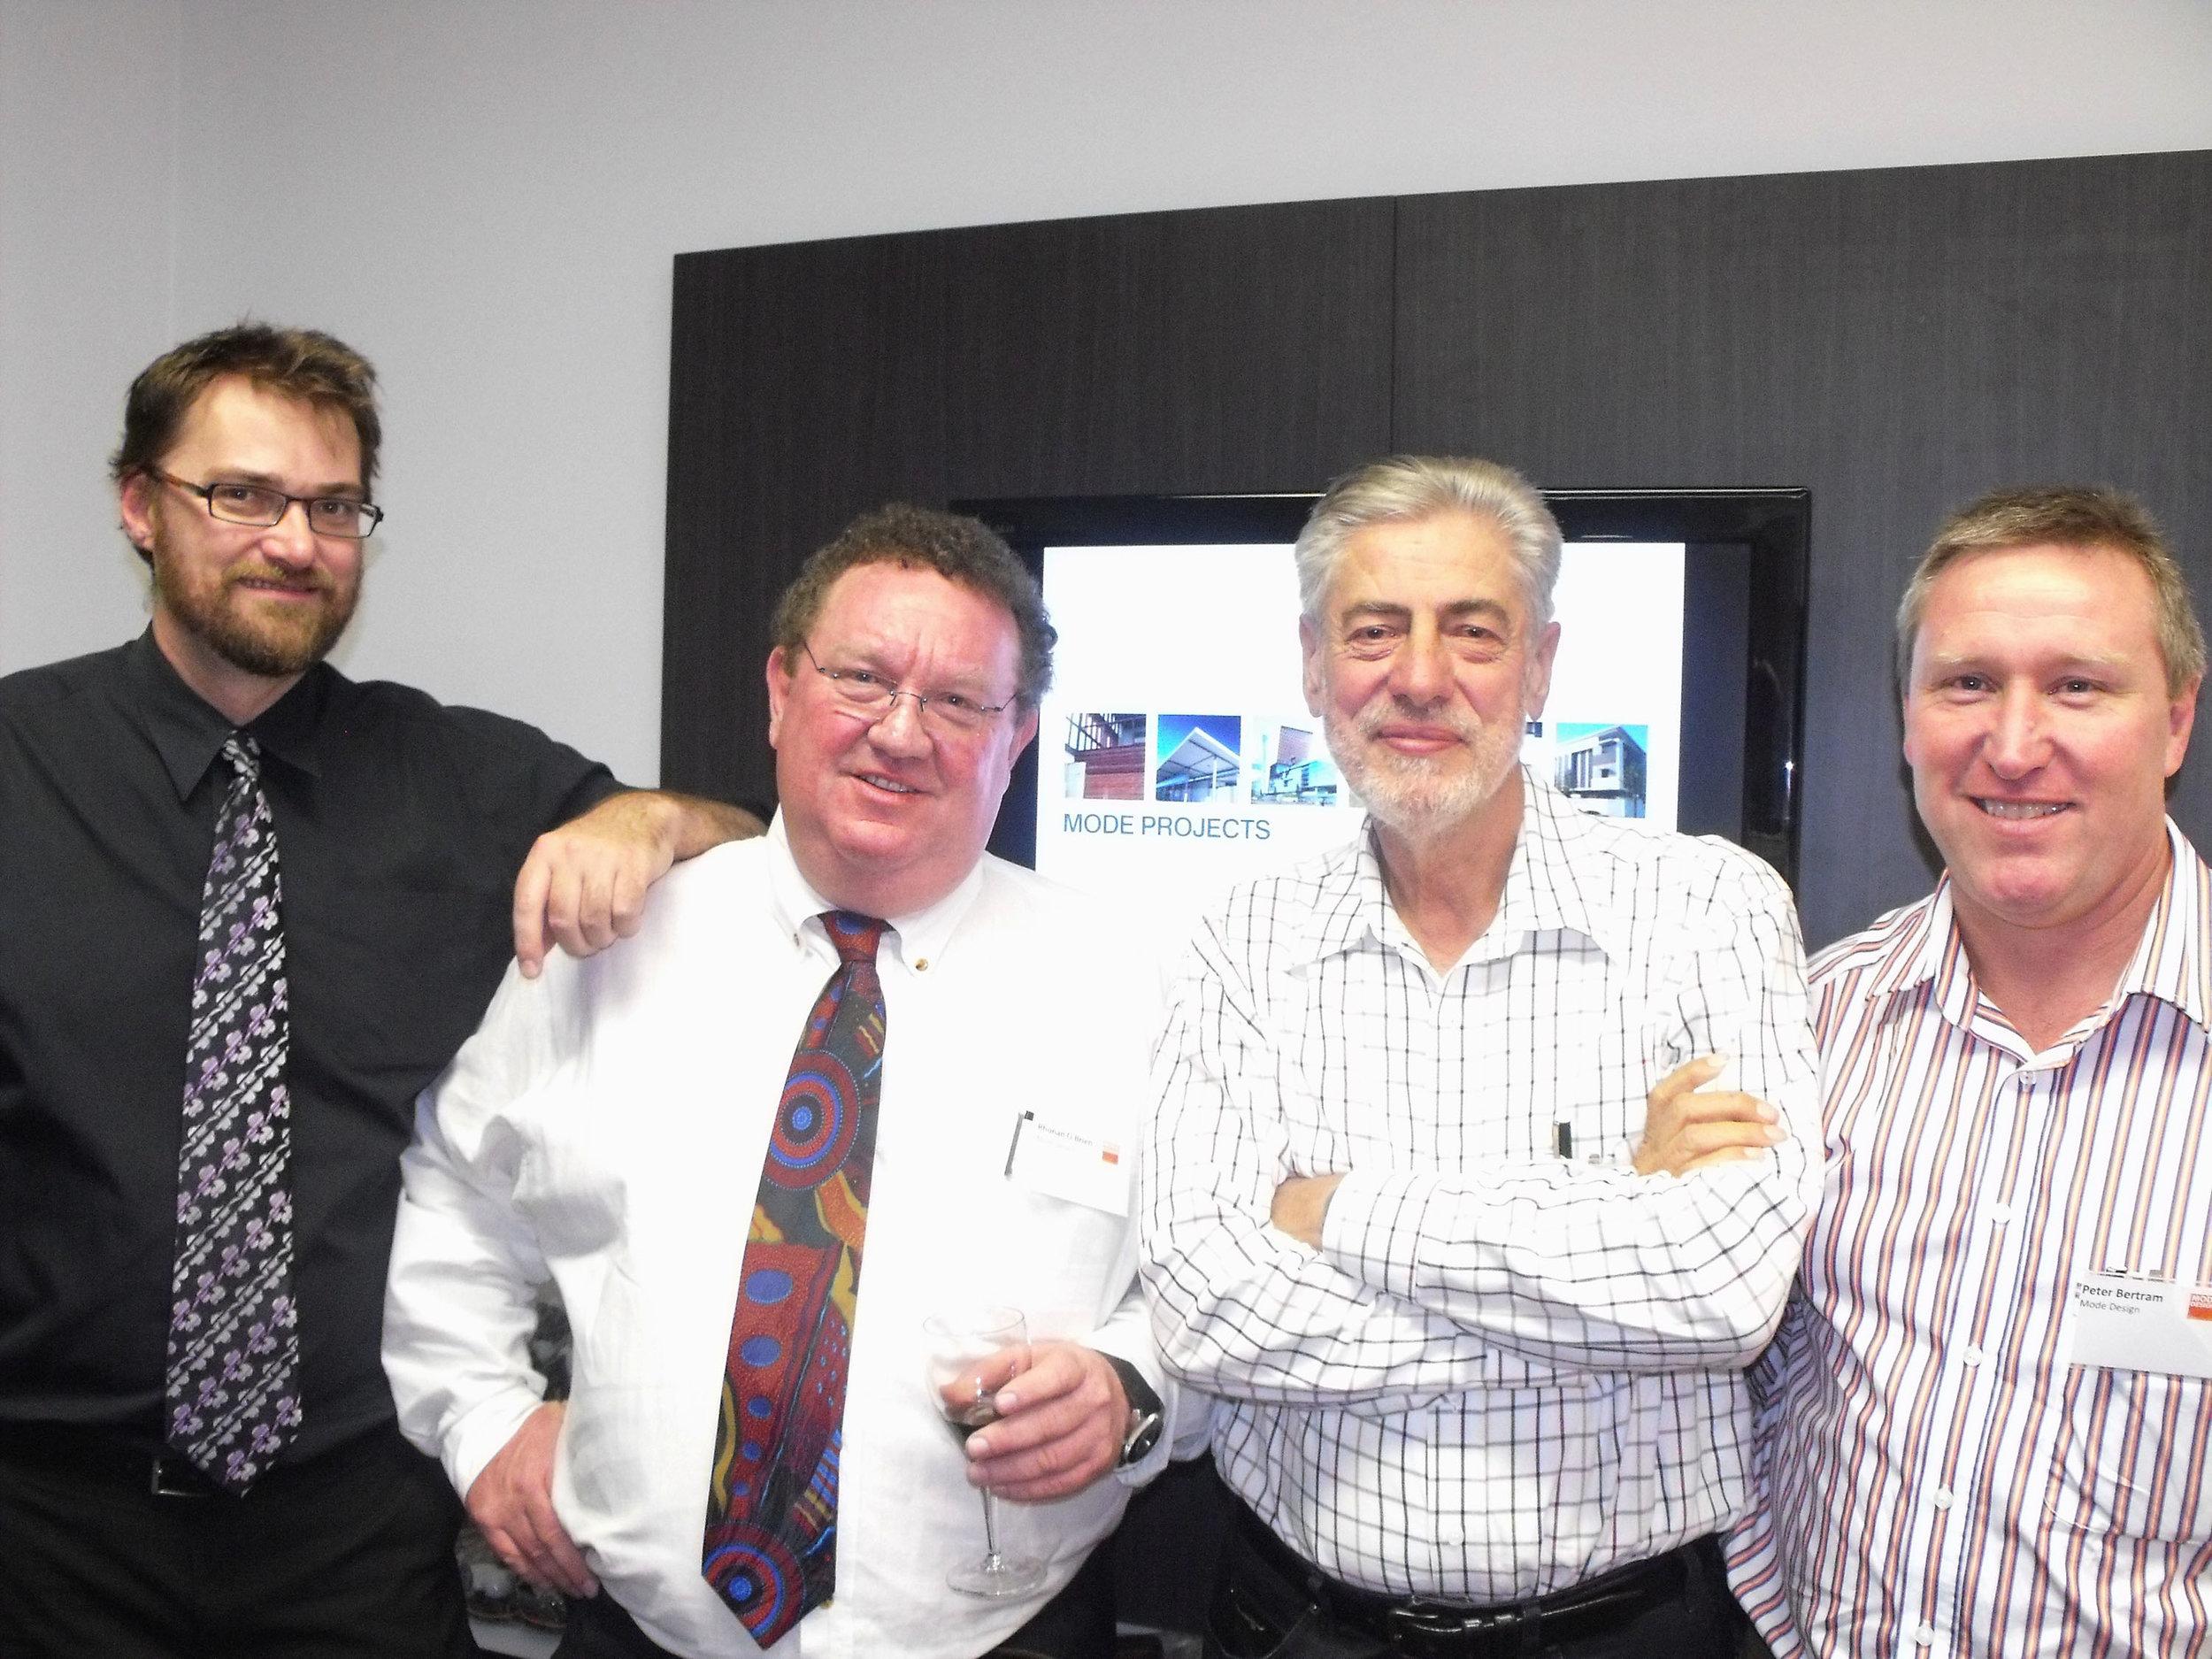 Rob McCray, Rhonan O'Brien, Eddie Codd, Peter Bertram_hi res.JPG